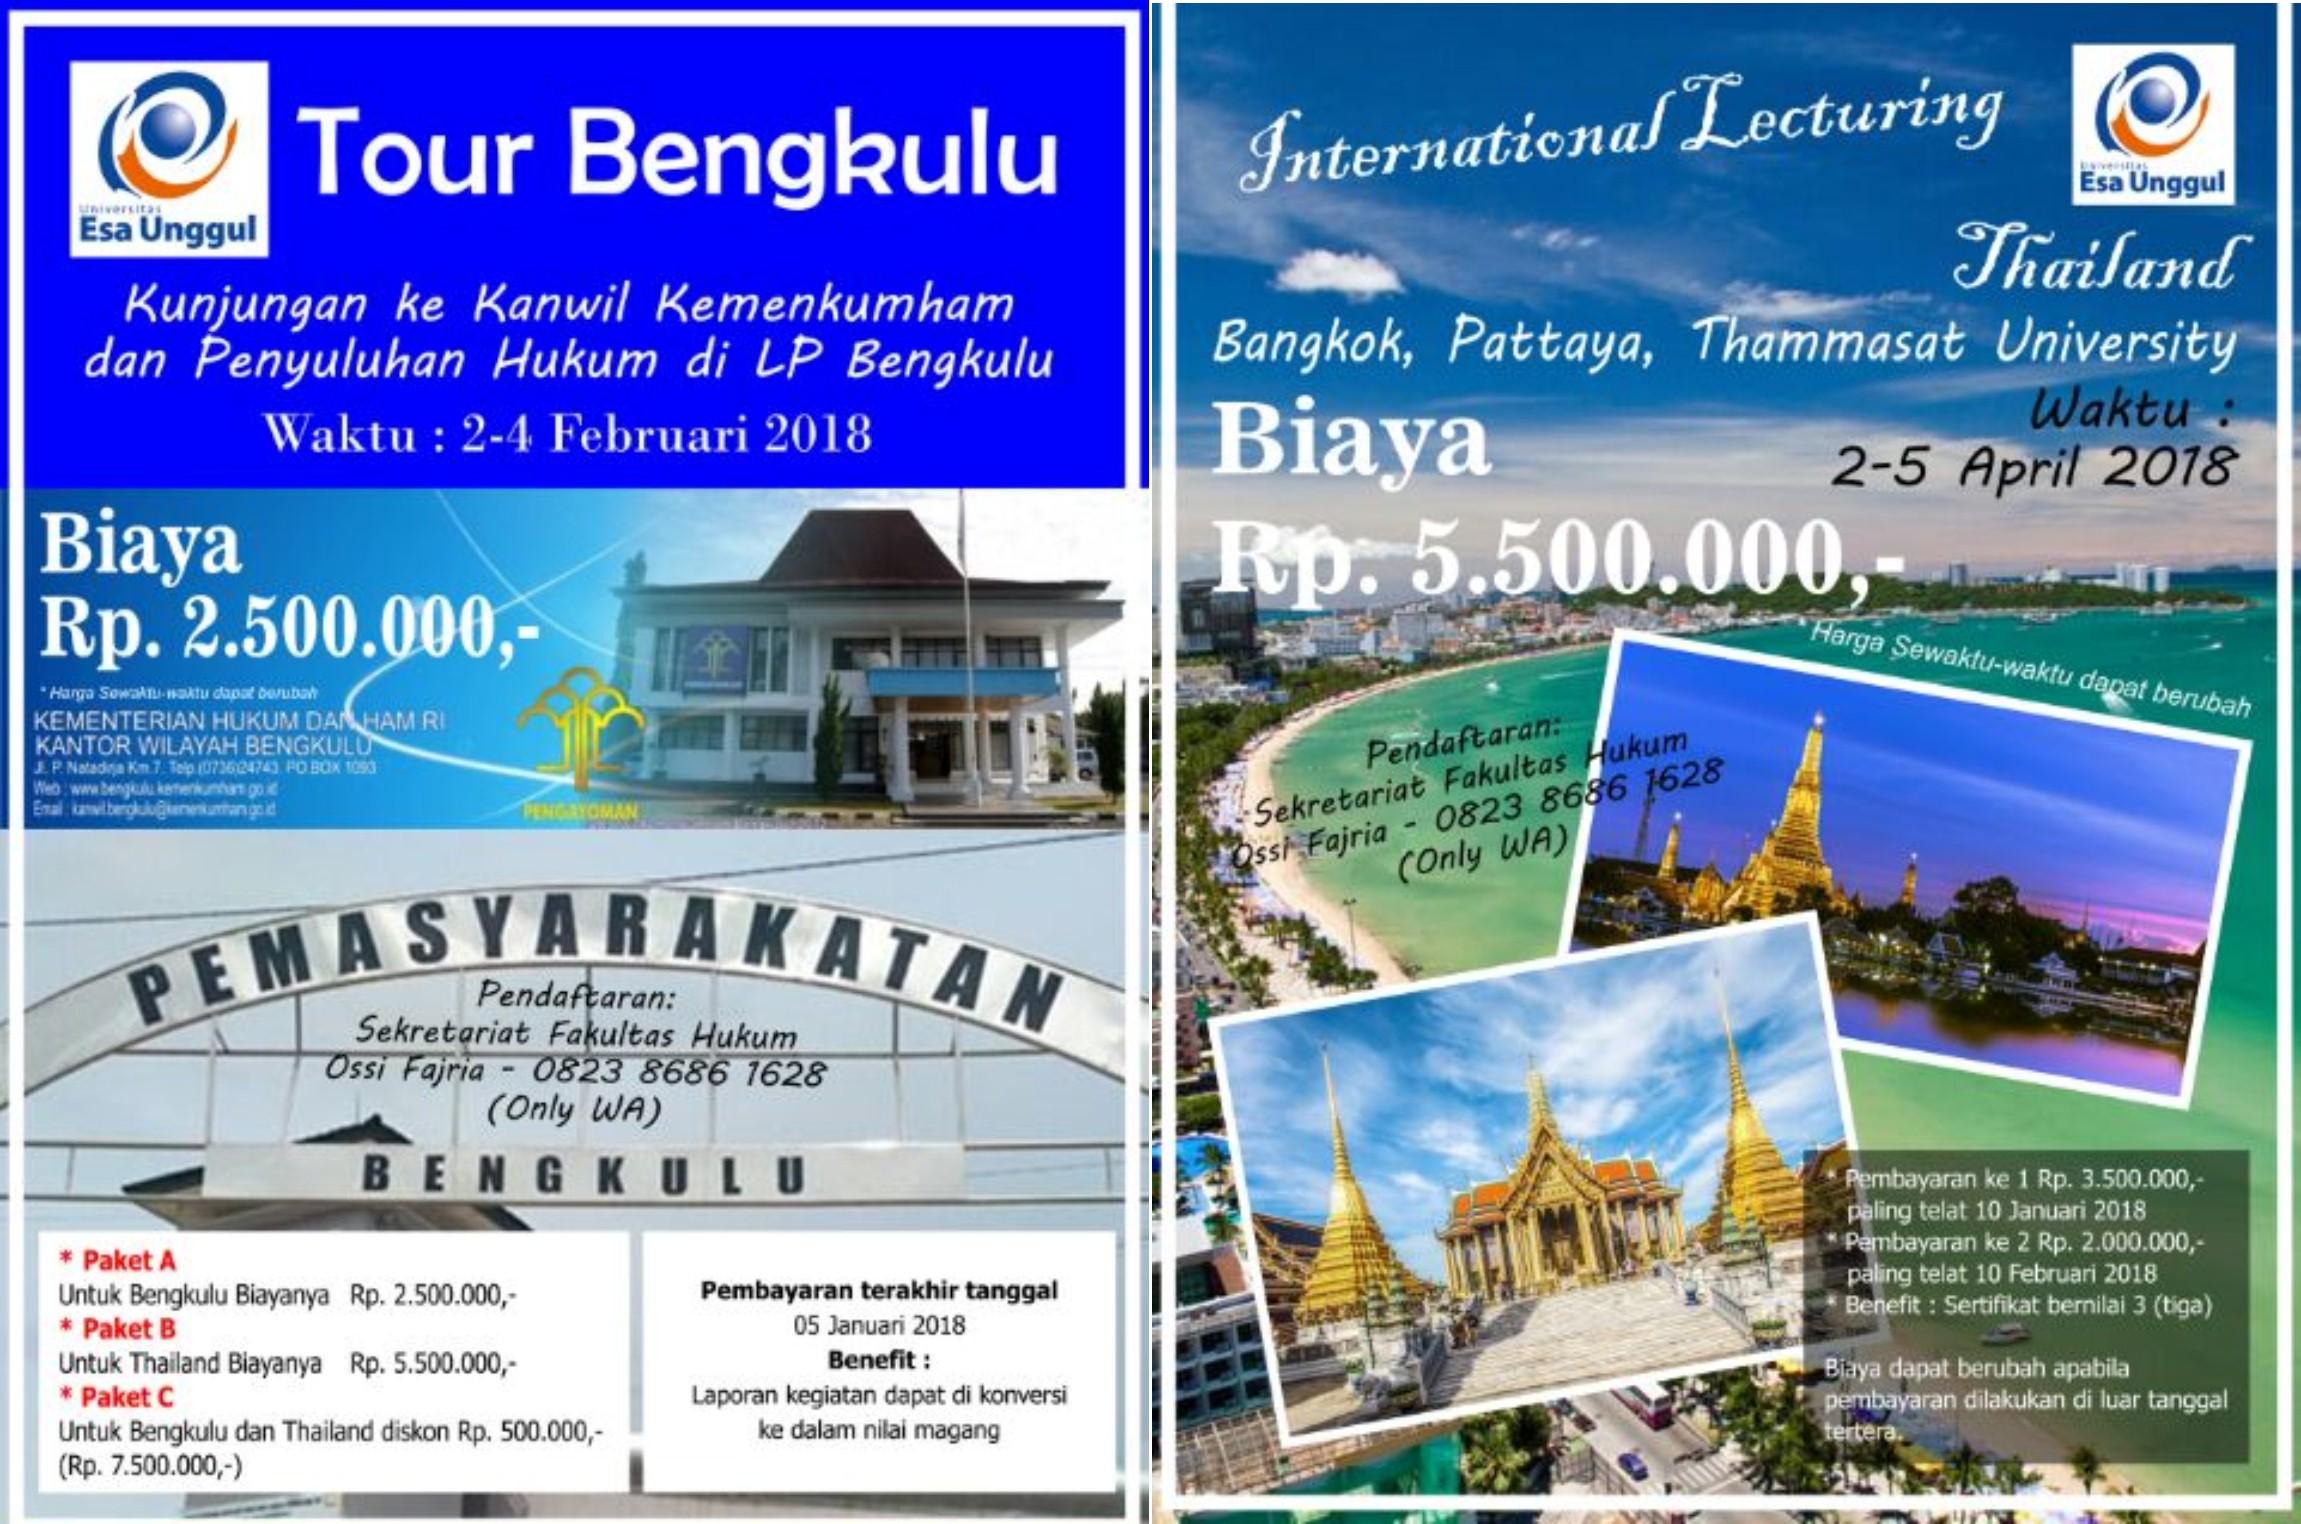 Akreditasi Fakultas Universitas Esa Unggul Fakultas Teknik Universitas Esa Unggul Pu Jakarta